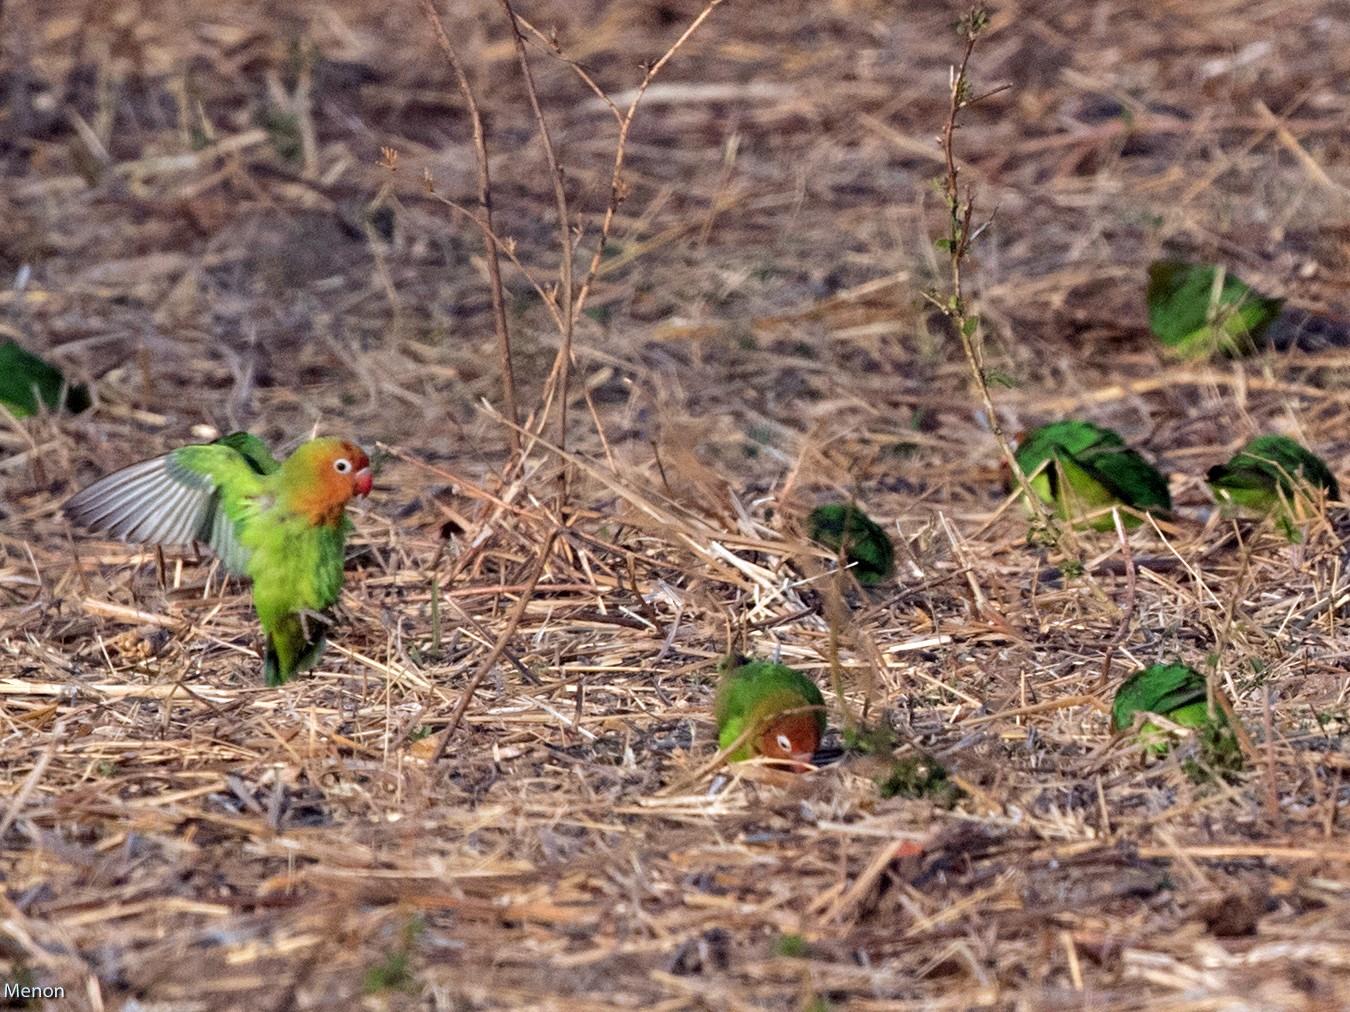 Lilian's Lovebird - Vivek Menon